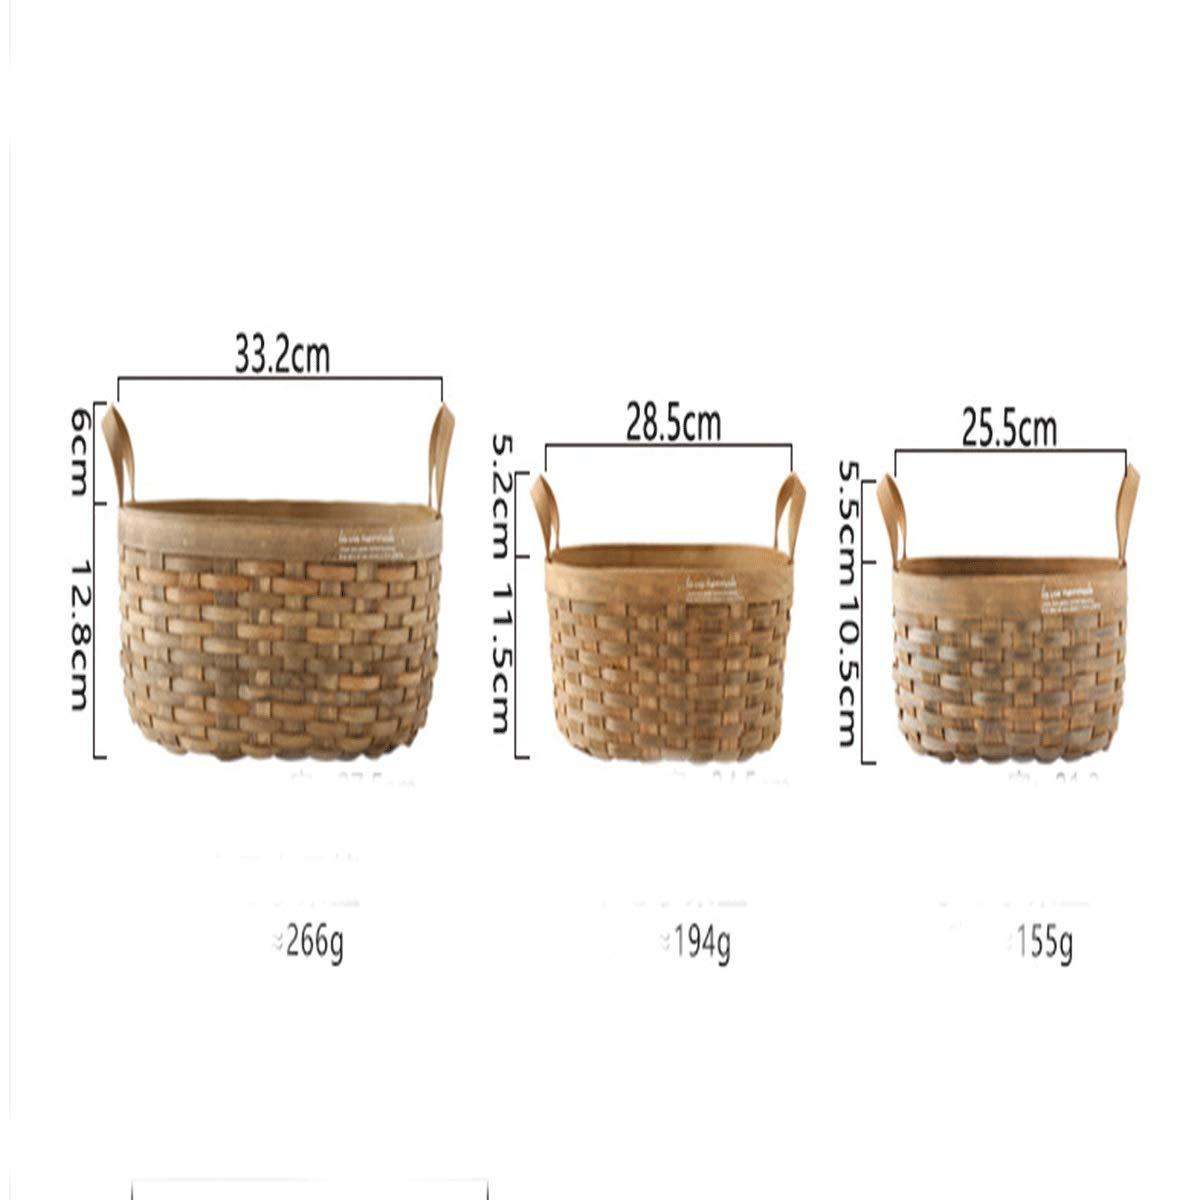 Tongboshi Bread Basket, Hand-Woven Storage Basket (with Handle), Picnic Fruit Bread Basket, Storage Basket, Oval Fruit Basket Three-Piece, Latest Models (Color : 3-Piece Set) by Tongboshi (Image #3)